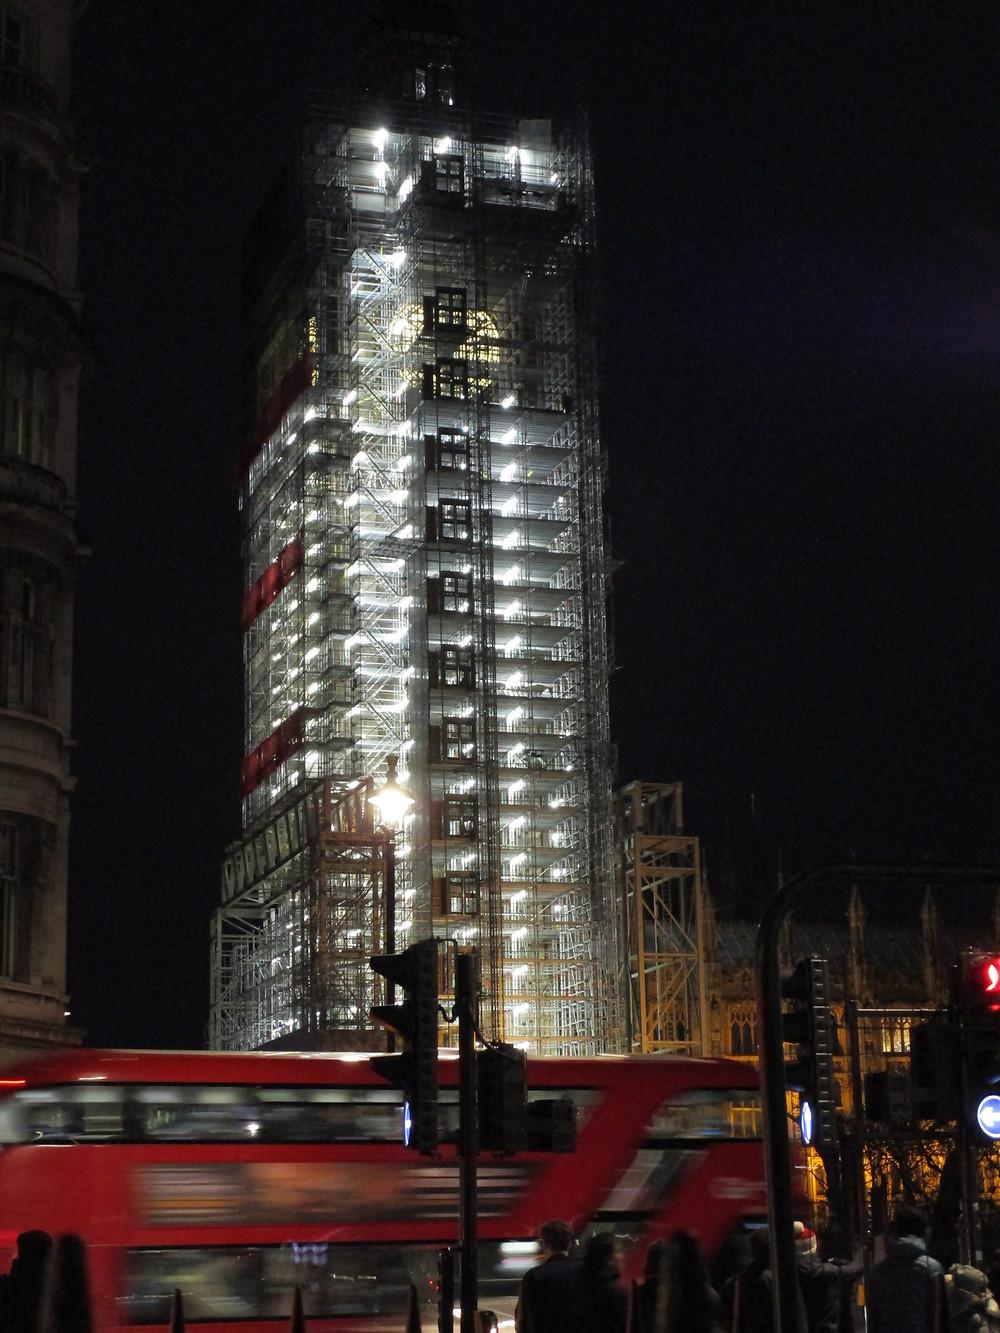 Big Ben at night (under construction)